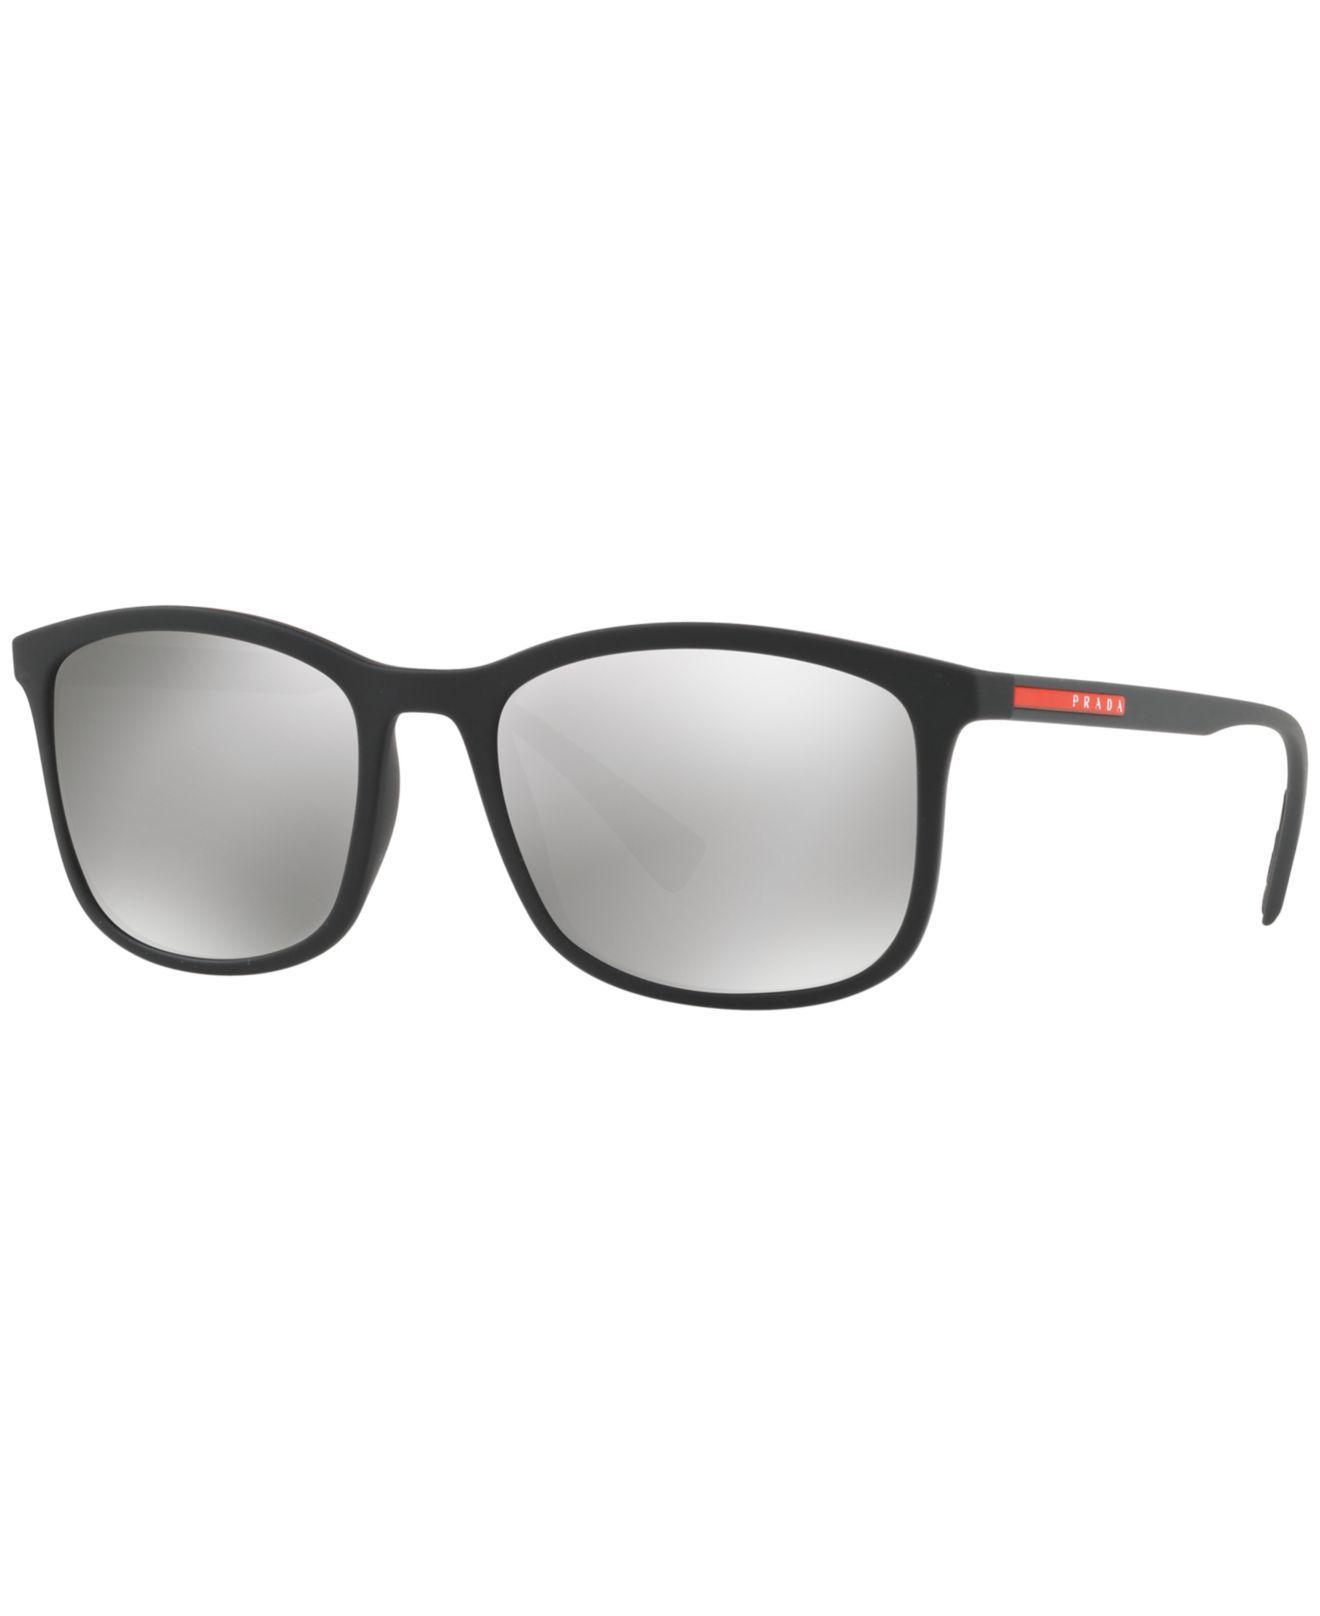 6bf4fb6465 Lyst - Prada Sunglasses